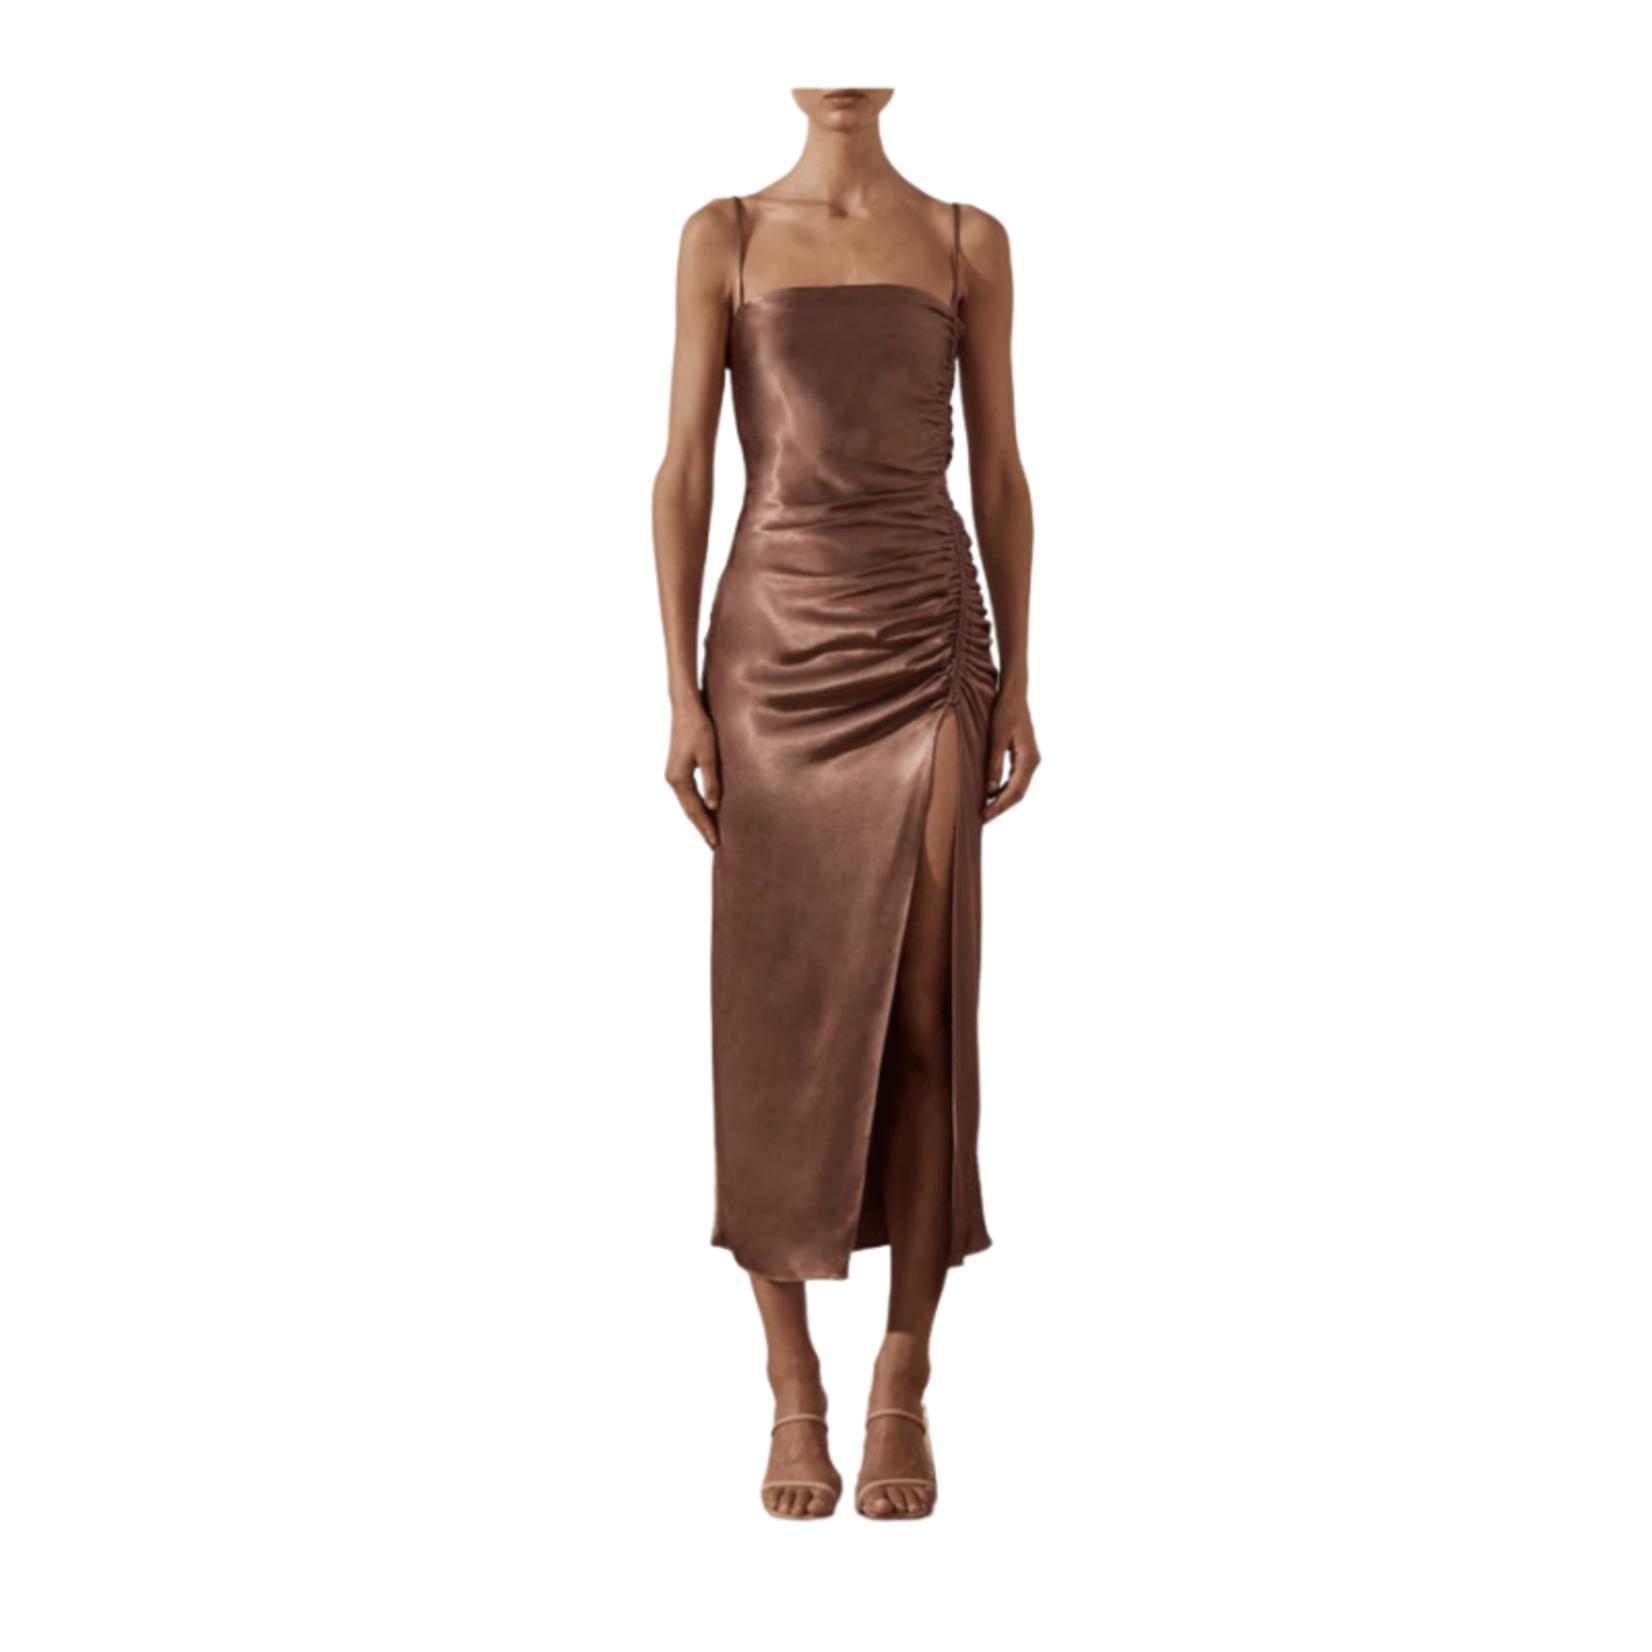 SHONA JOY Lily Bias Ruched Midi Dress